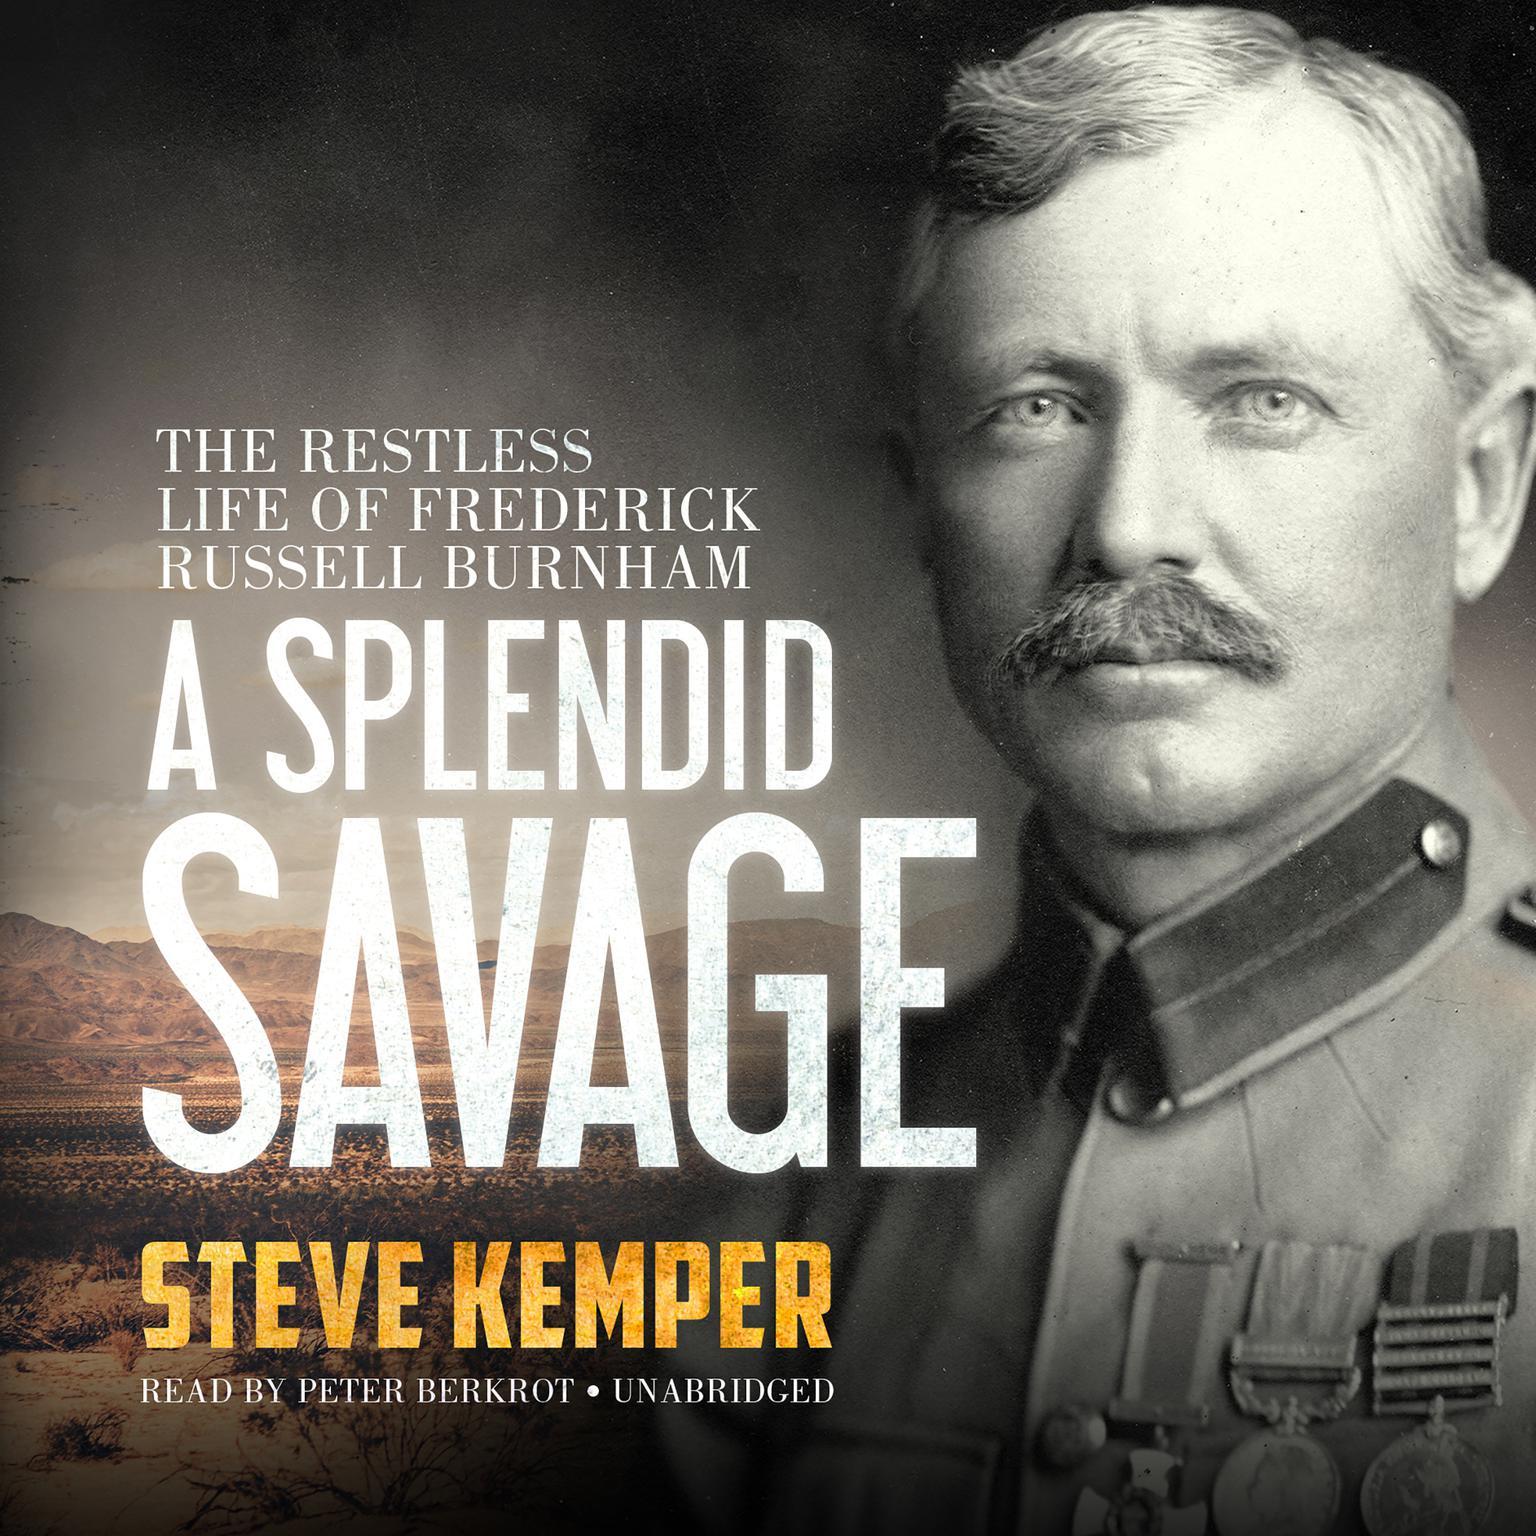 A Splendid Savage: The Restless Life of Frederick Russell Burnham Audiobook, by Steve Kemper